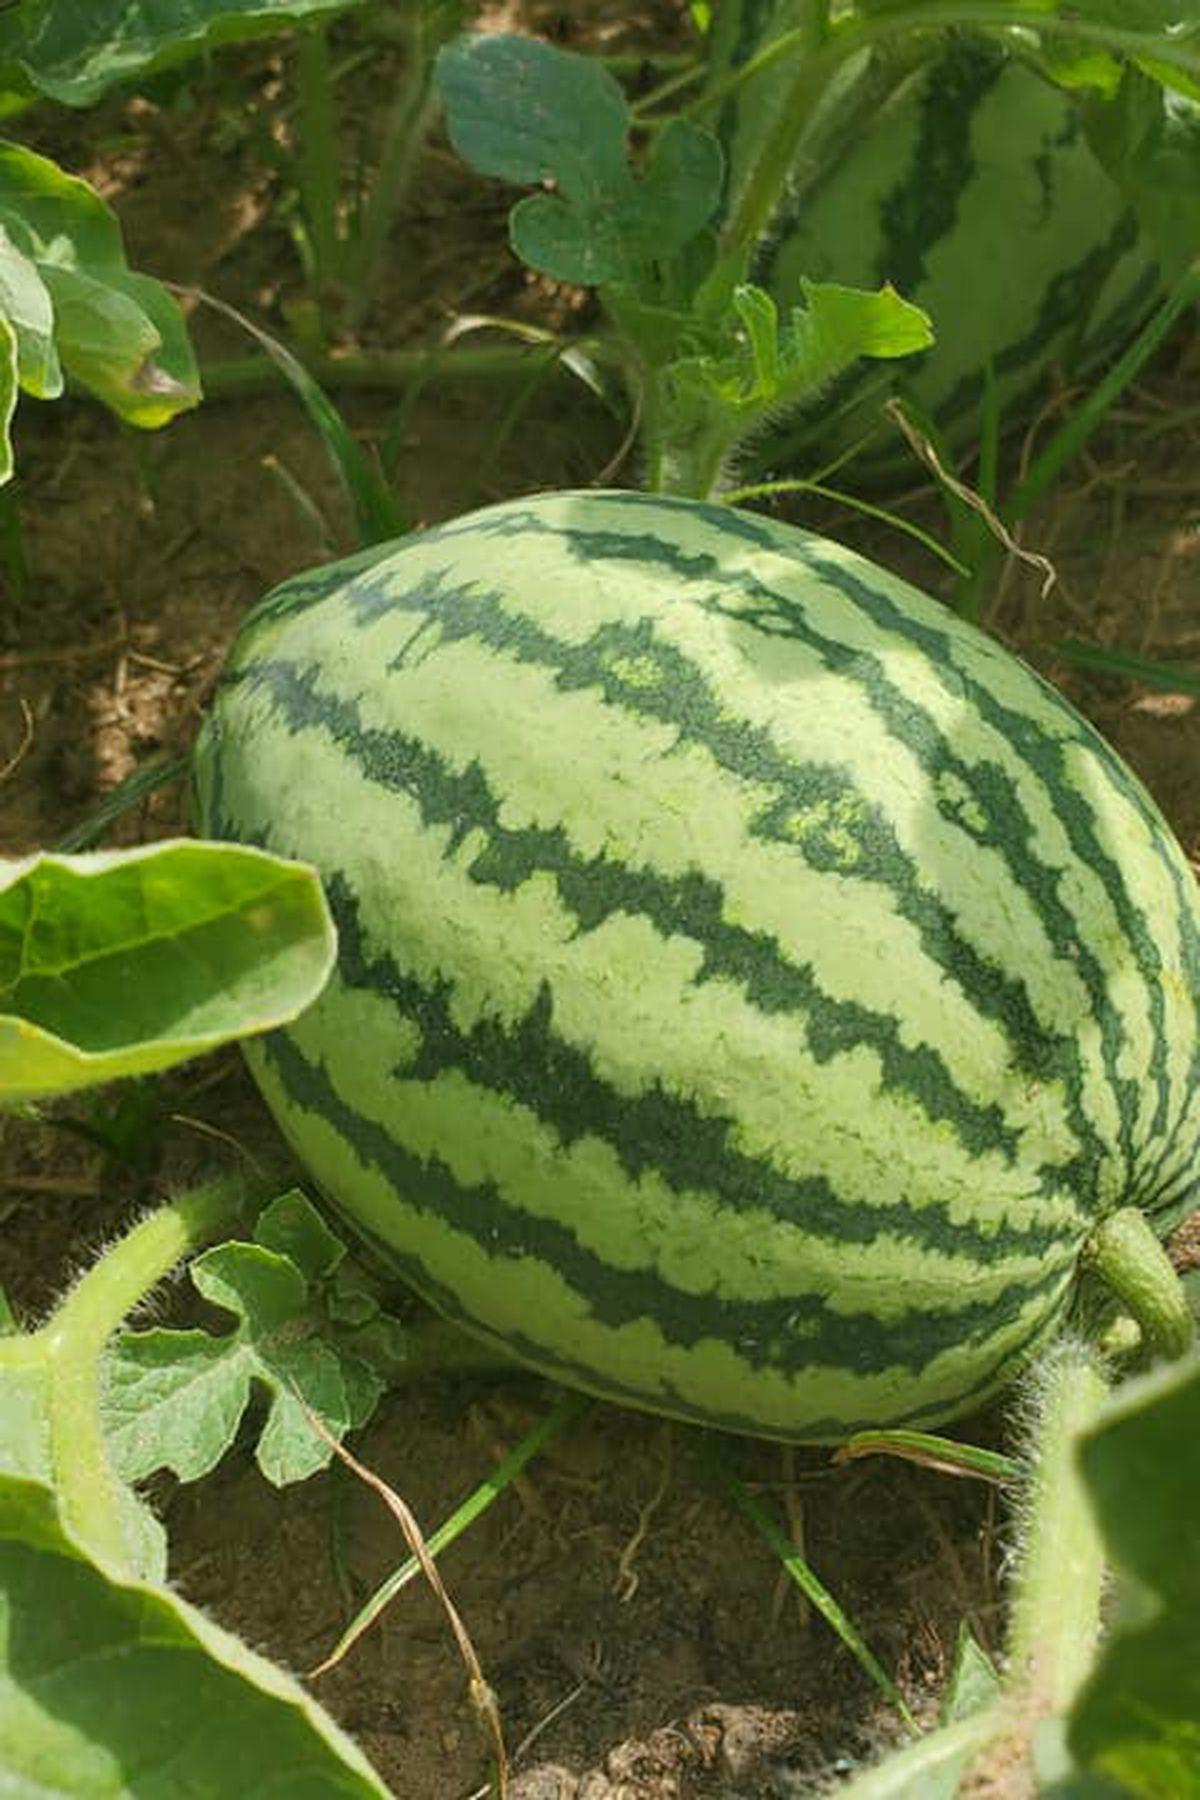 Georgia S Watermelon Season Begins